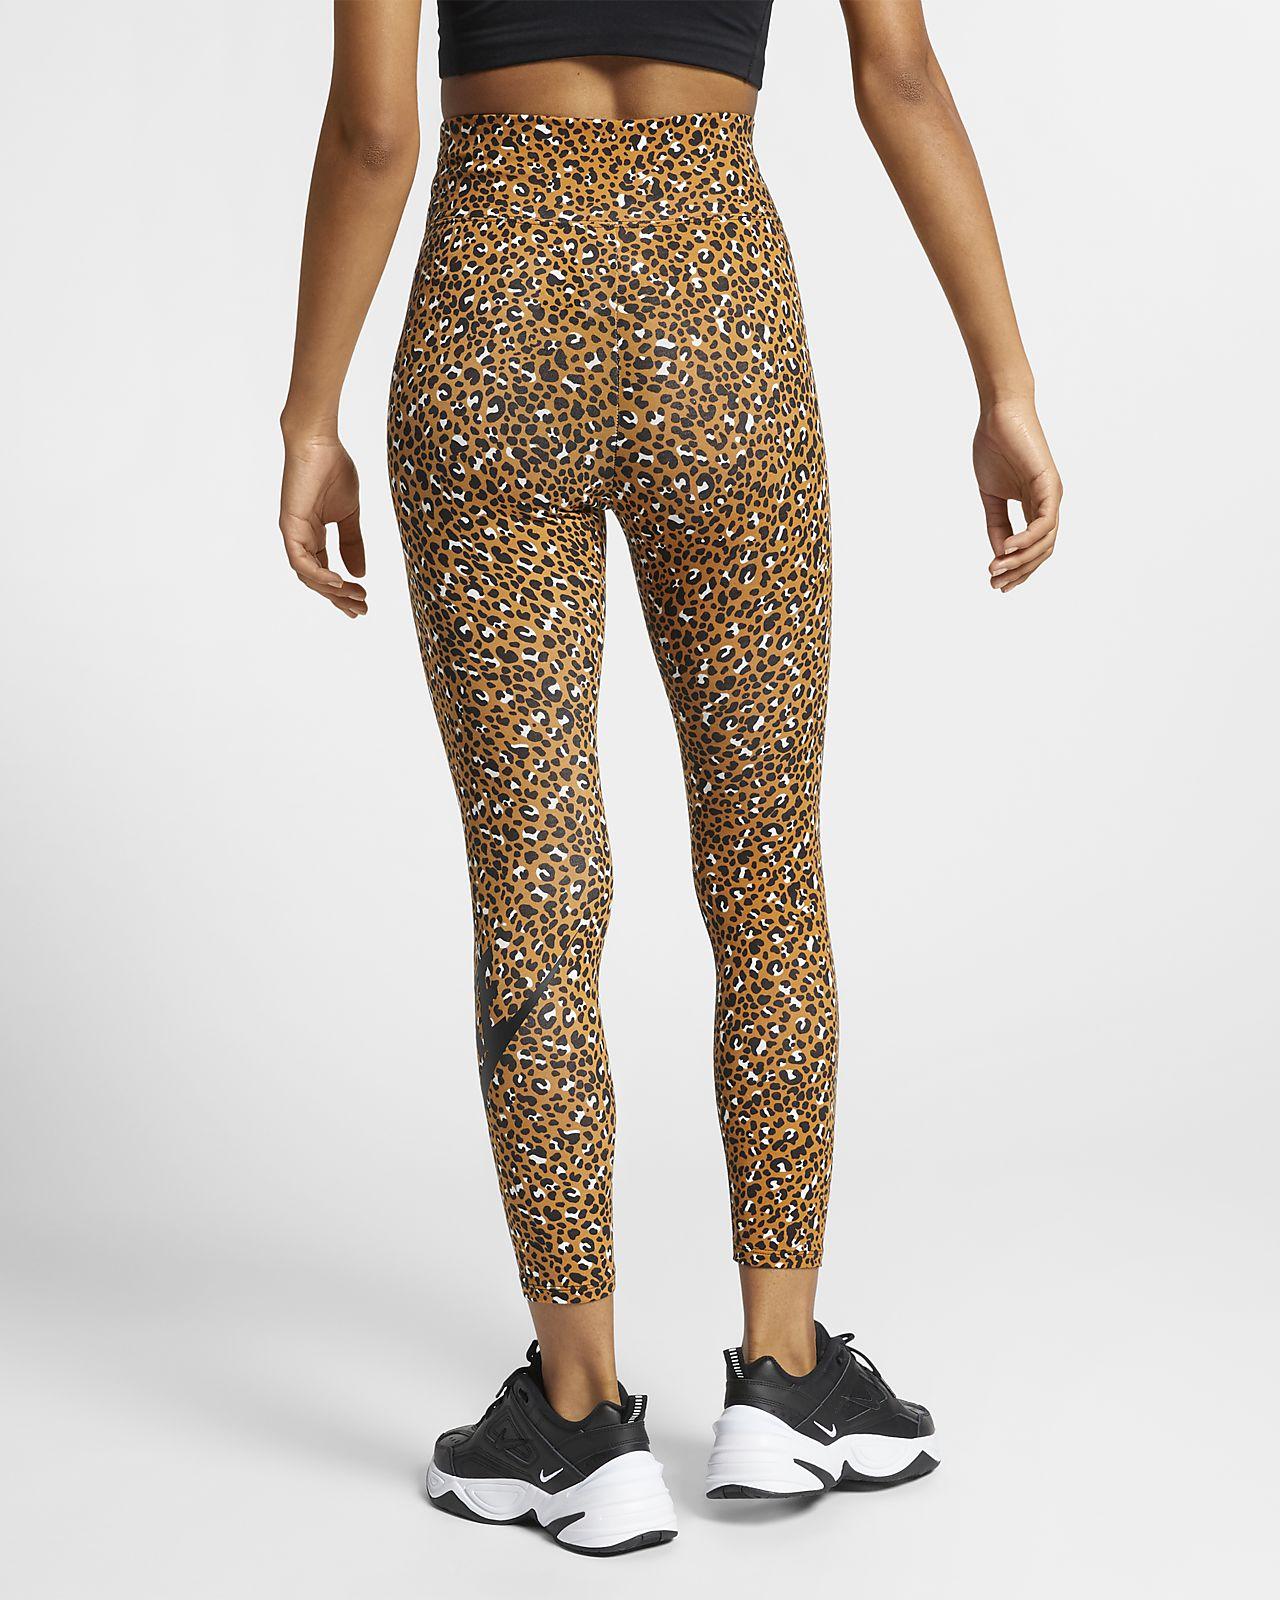 e4386aefa2 Nike Sportswear Animal Print Women's Leggings